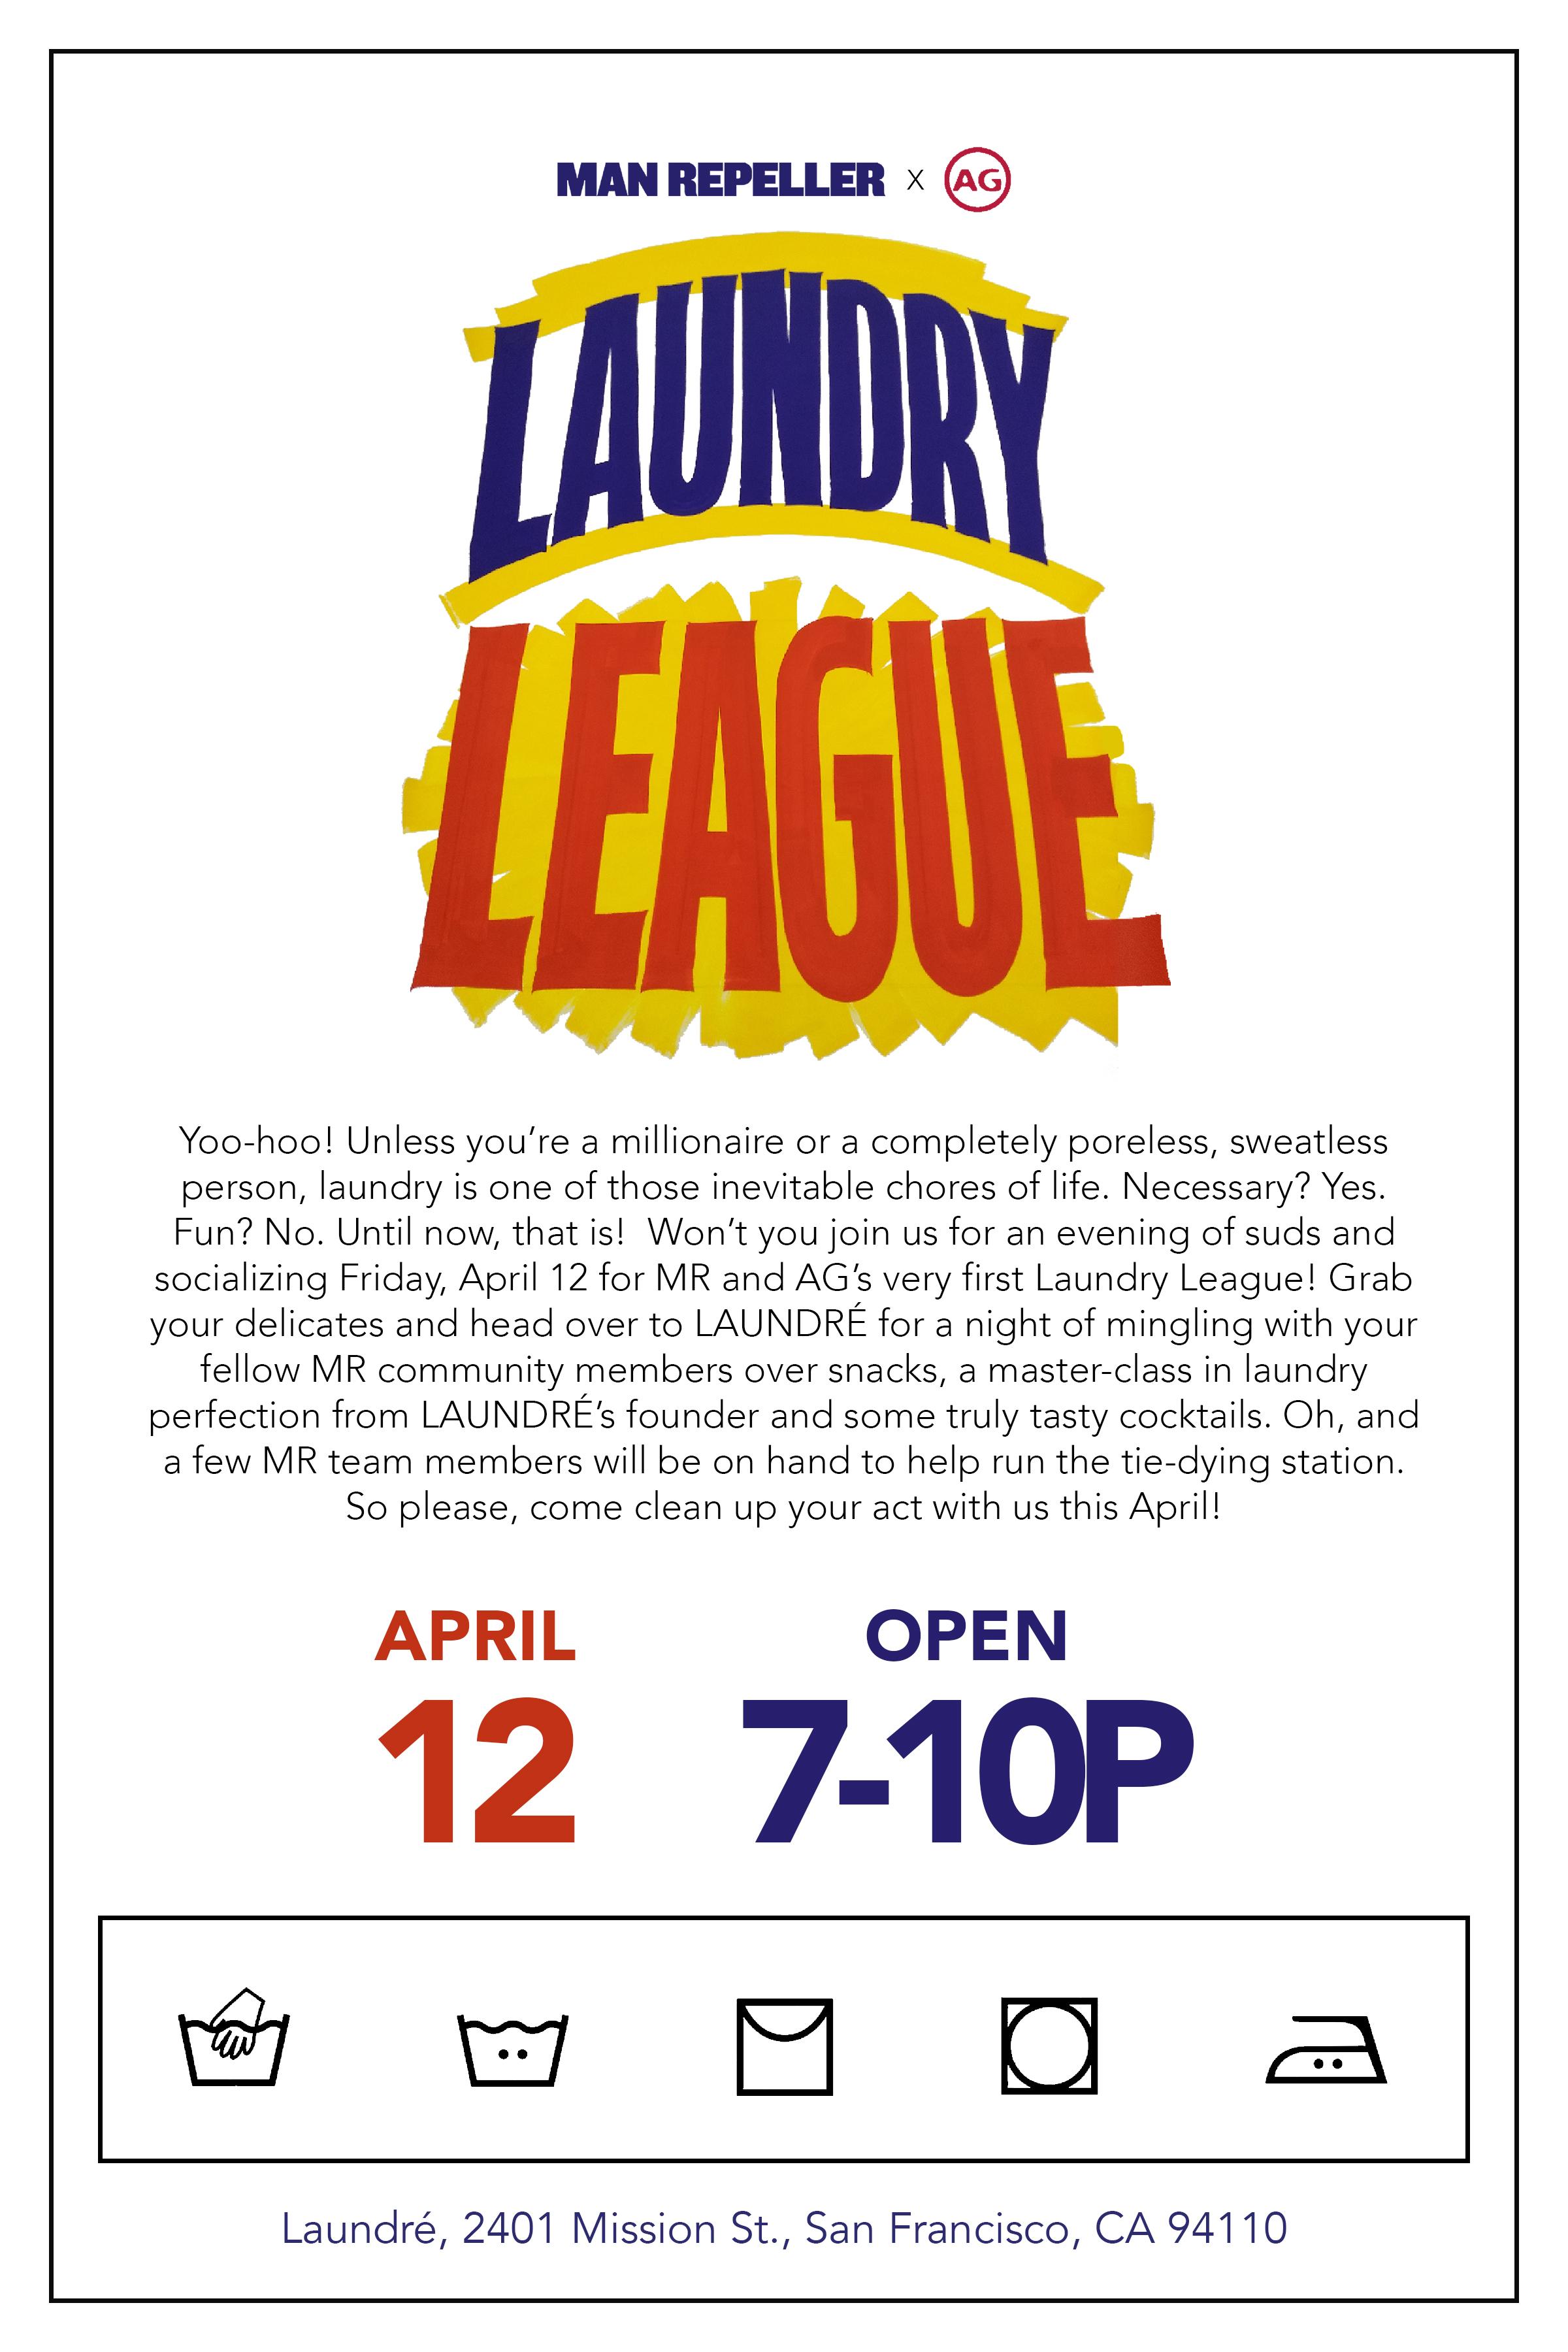 man repeller x ag jean_laundry league_invitation.jpg